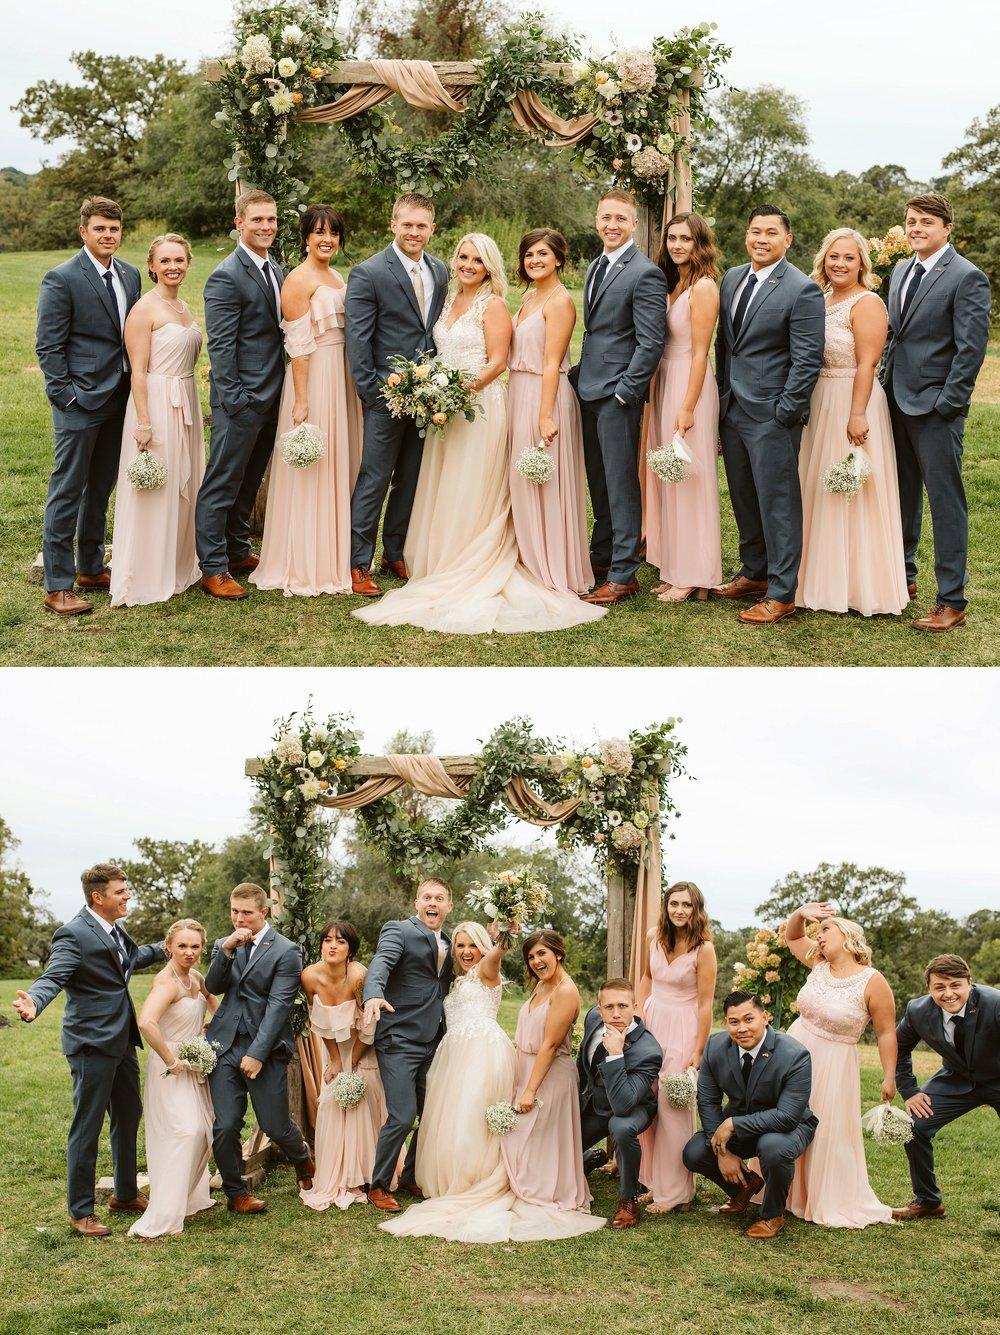 john-p-furber-farm-wedding-in-september-blush-and-coral-flowers-112.jpg